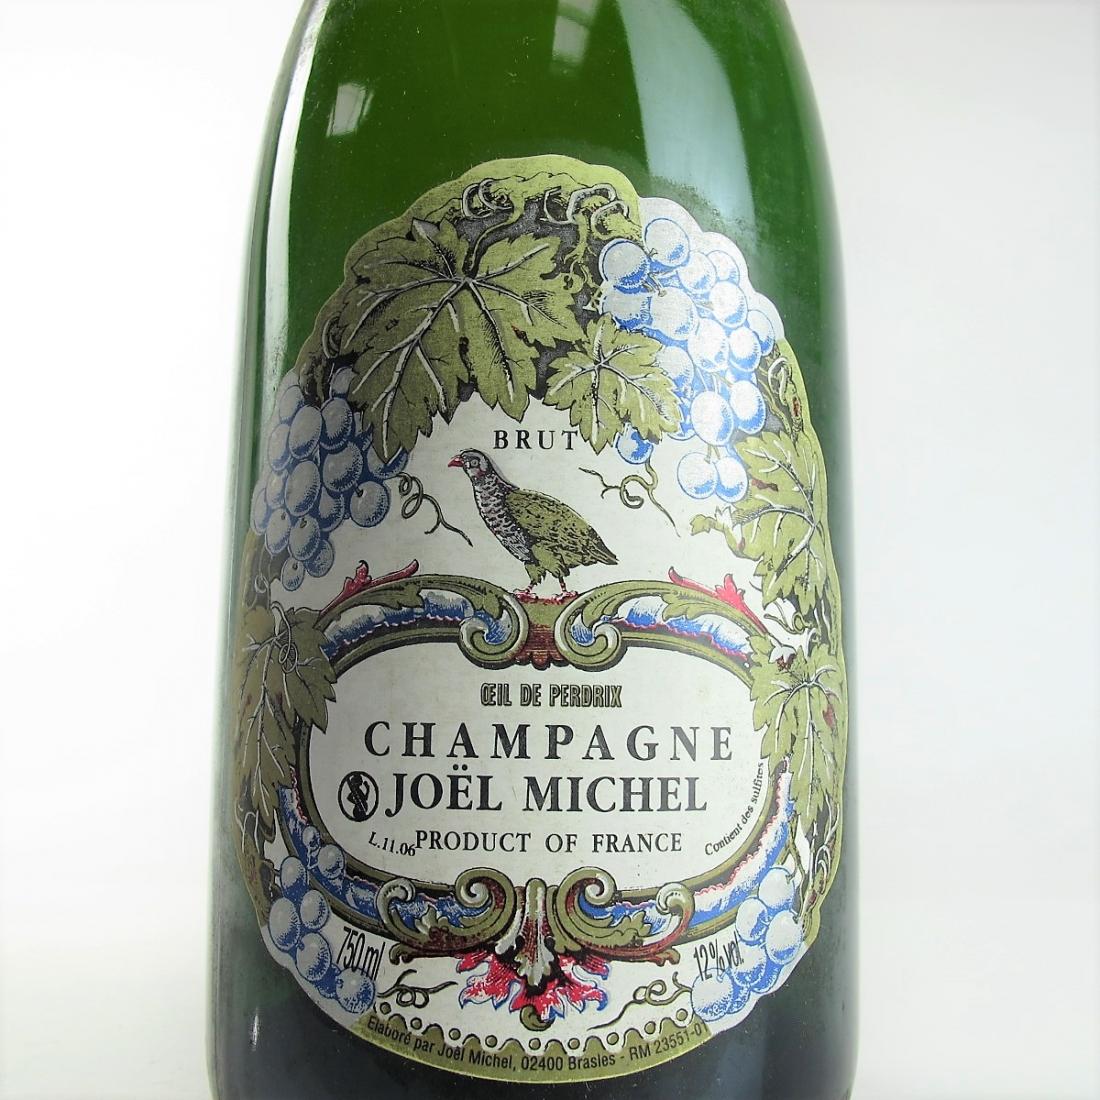 Joel Michel Brut NV Champagne